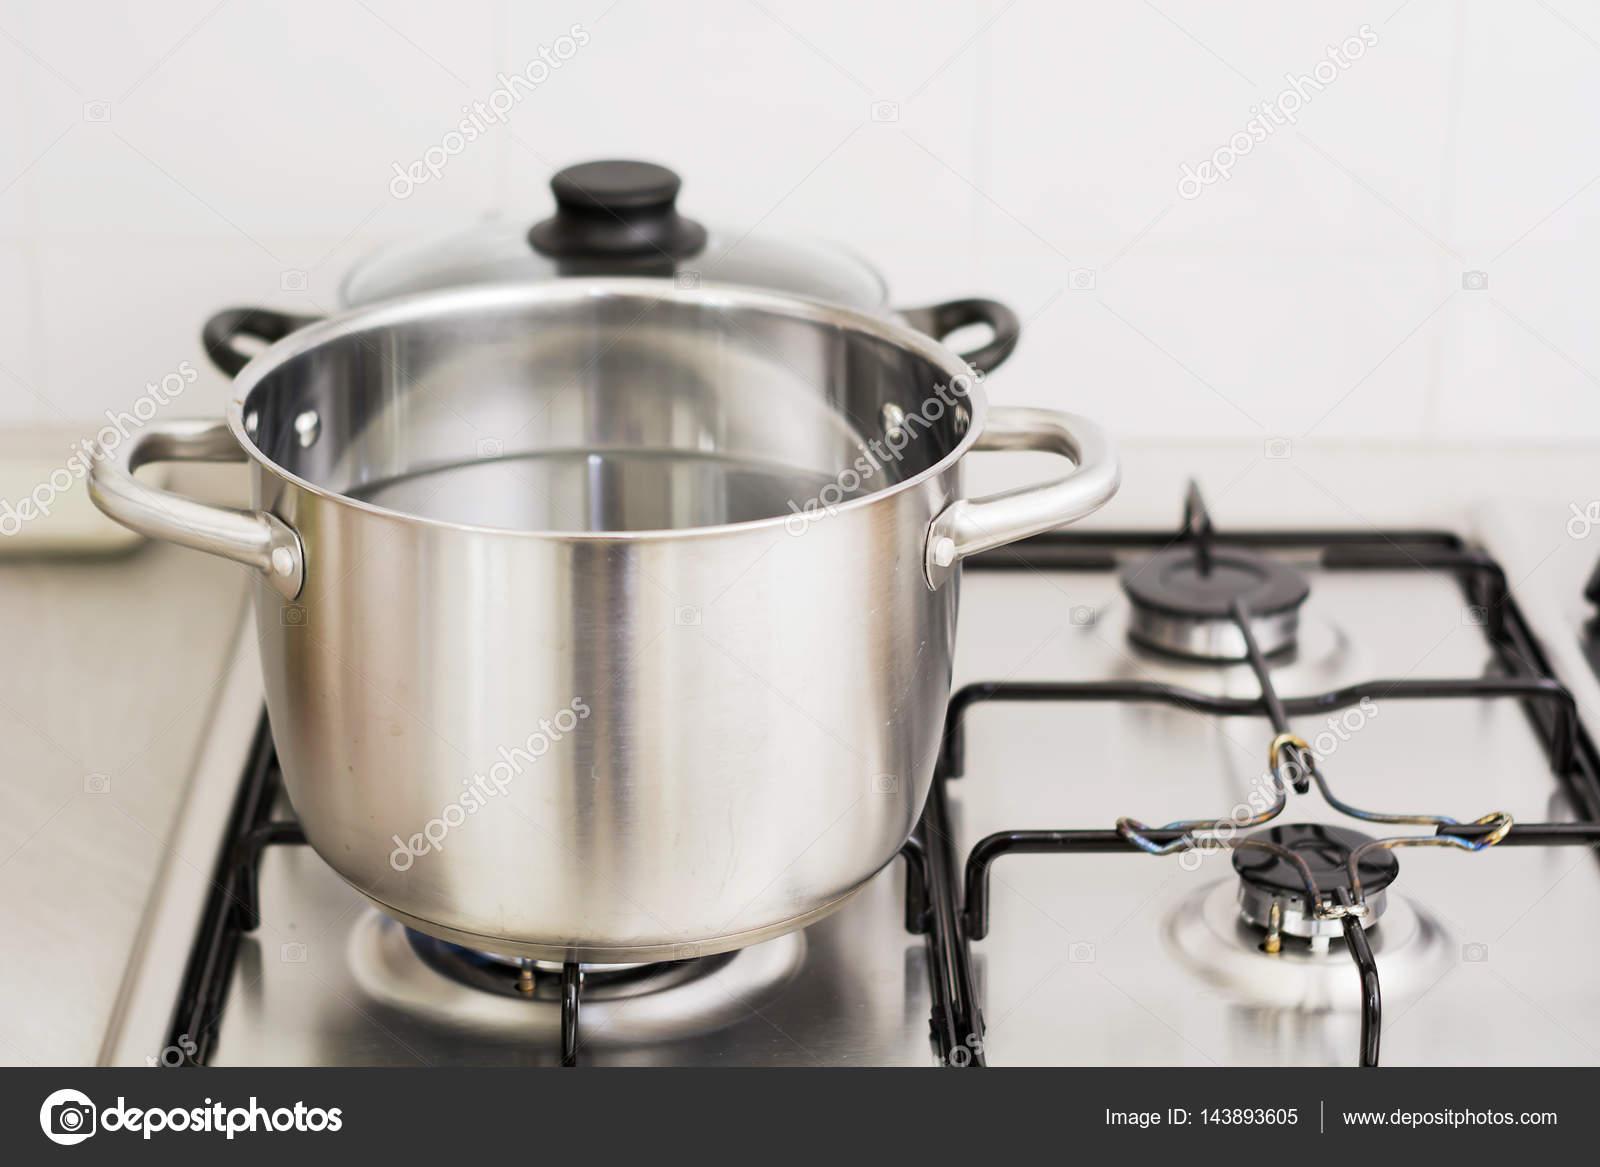 Edelstahl Kochtopf auf Gasherd — Stockfoto © rarrarorro ...